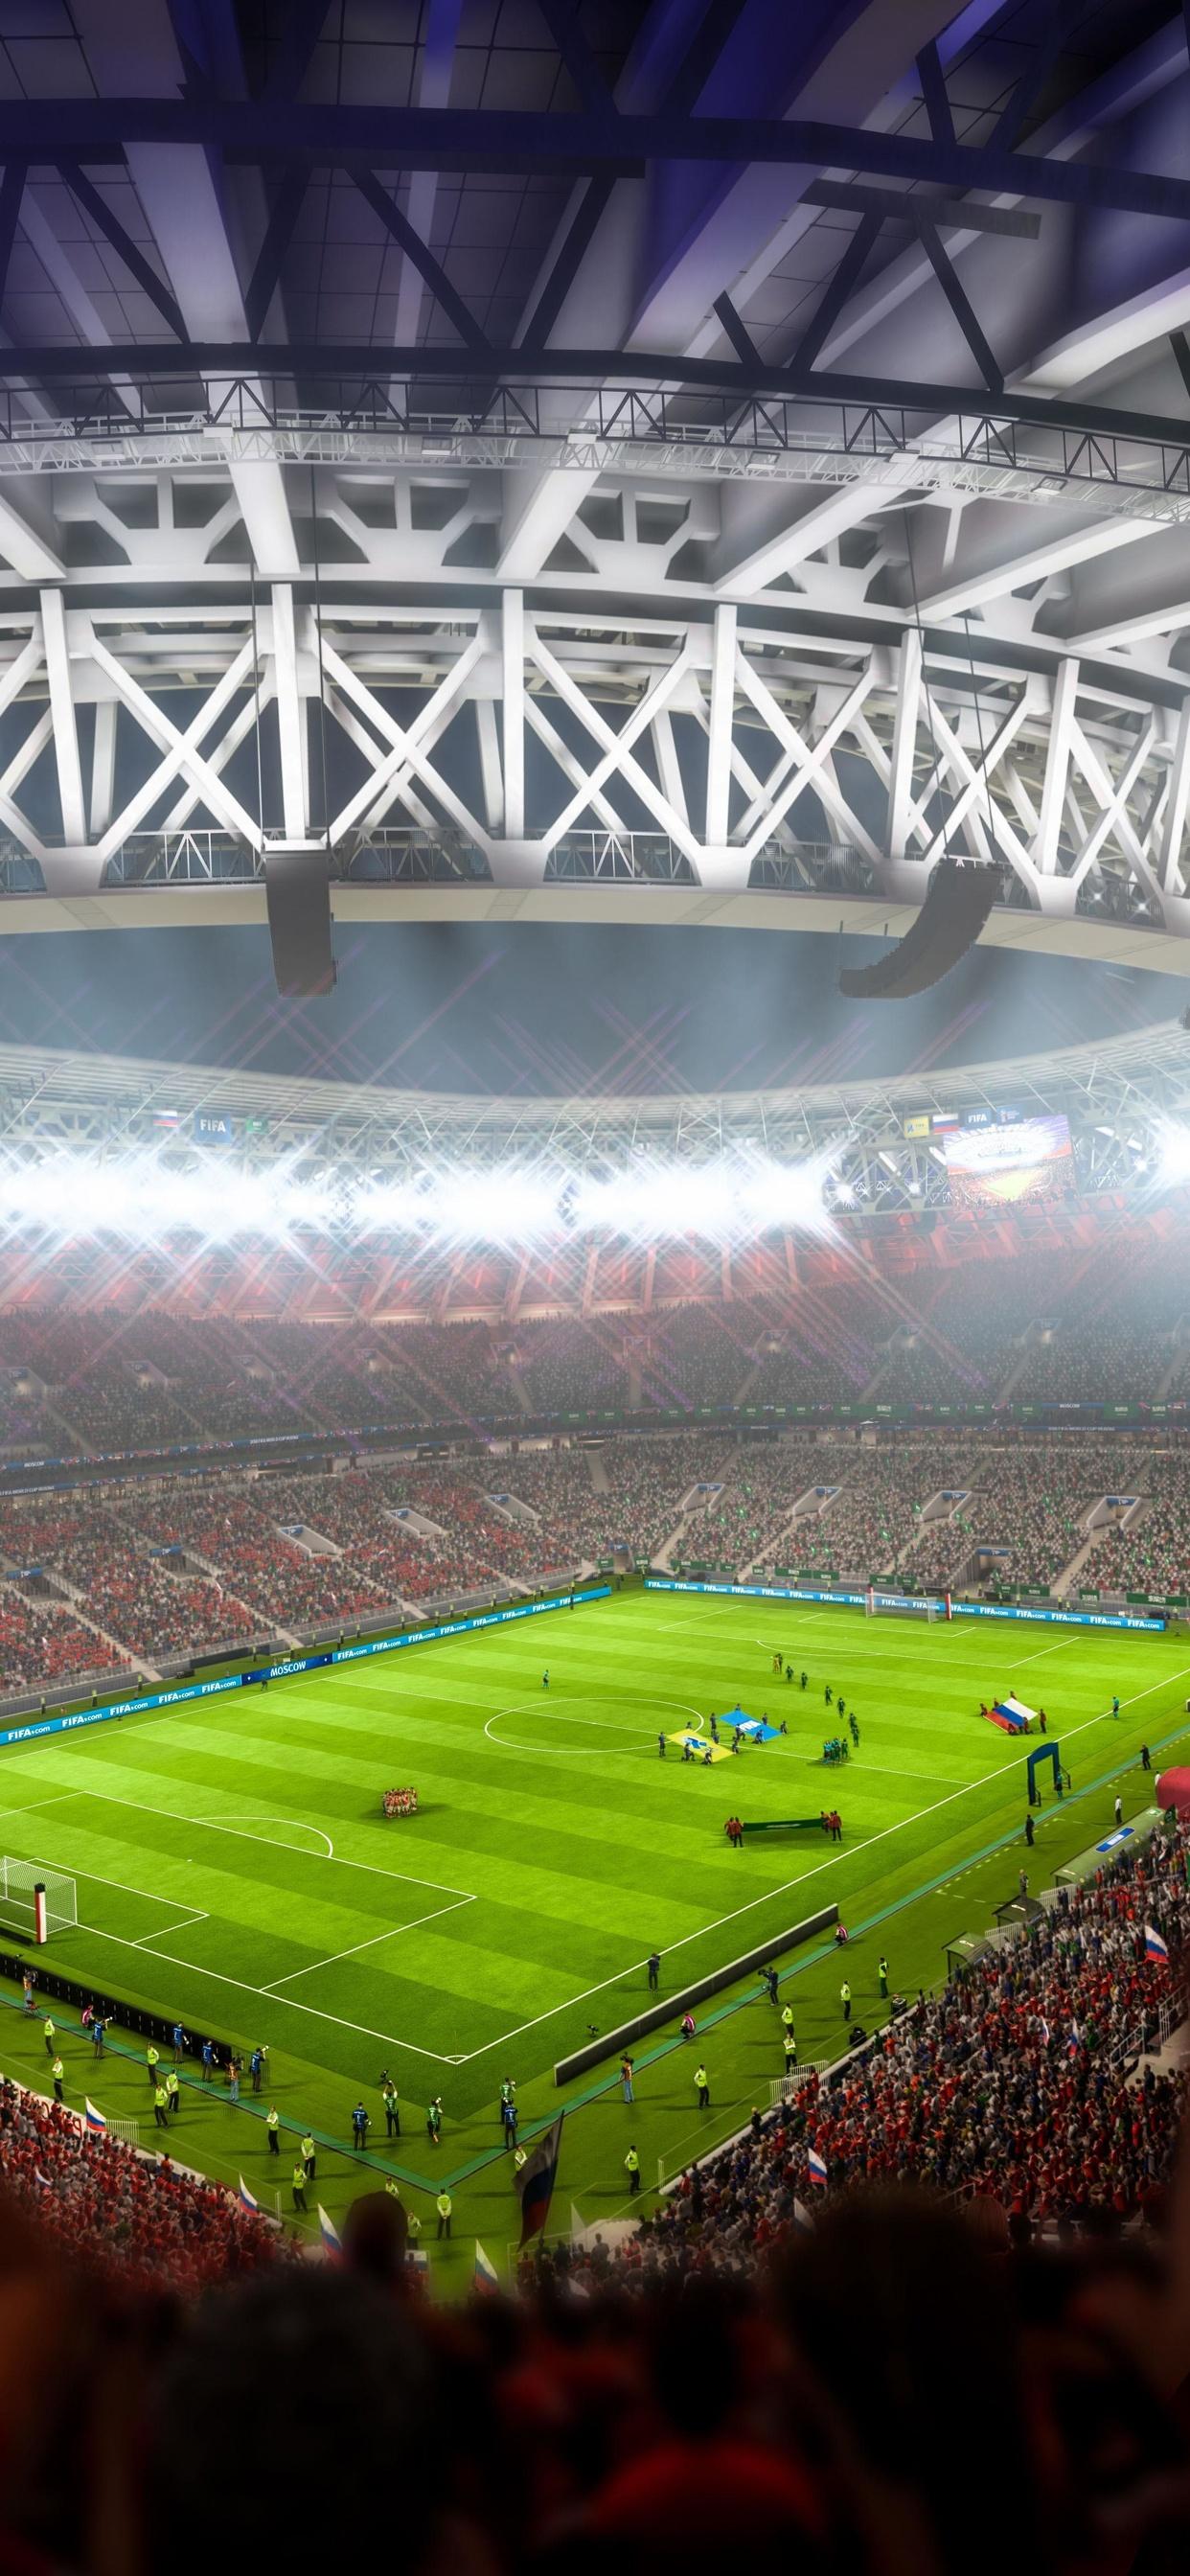 fifa-18-stadium-8k-bg.jpg